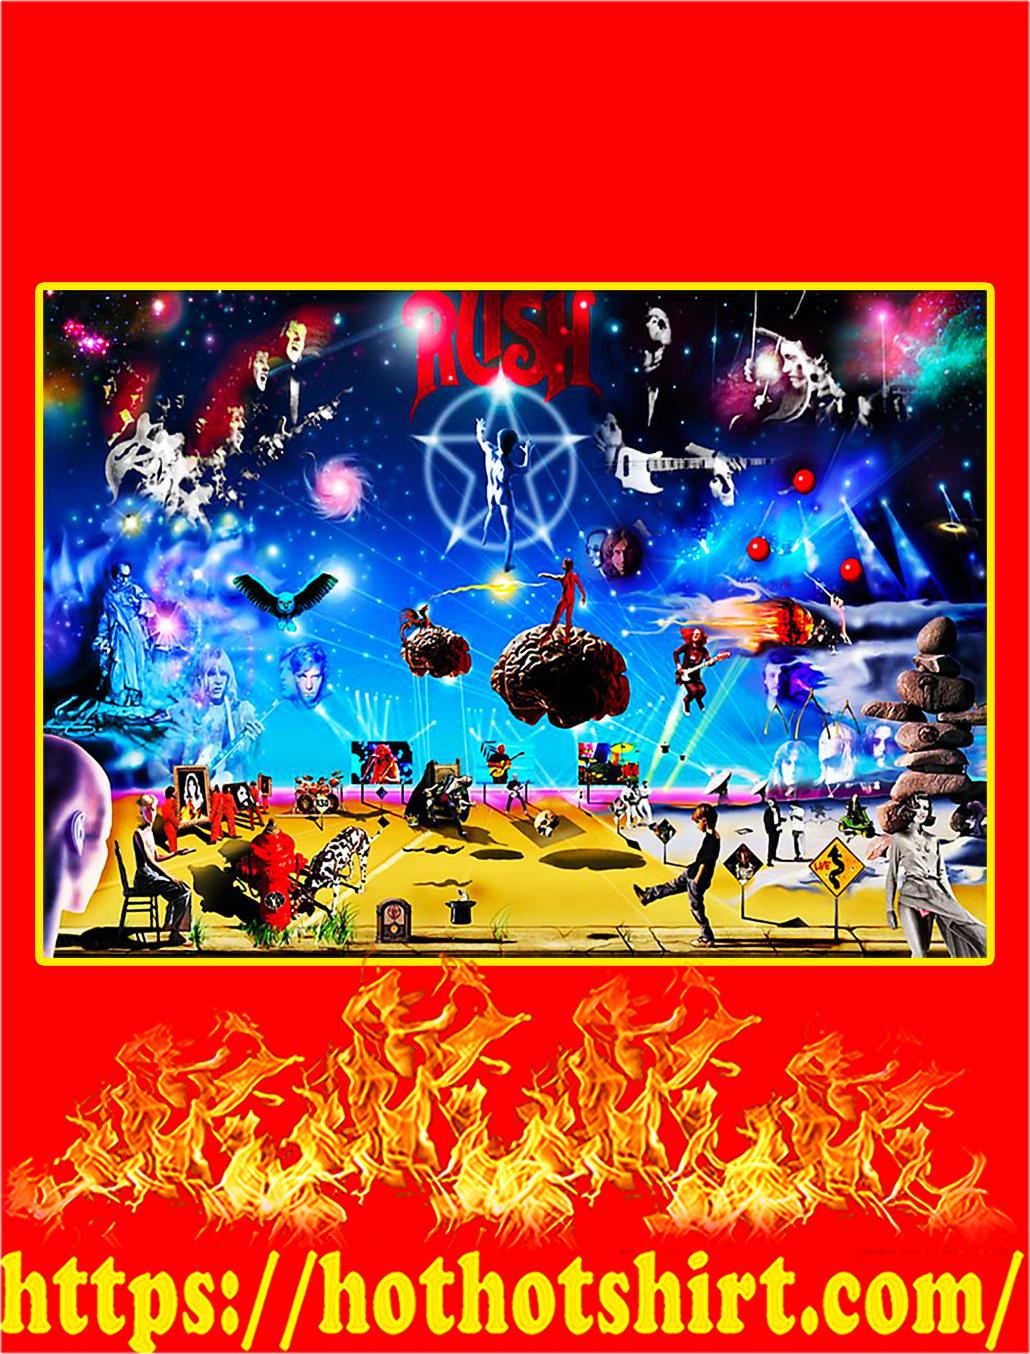 Rush All Album Poster - A2Rush All Album Poster - A2